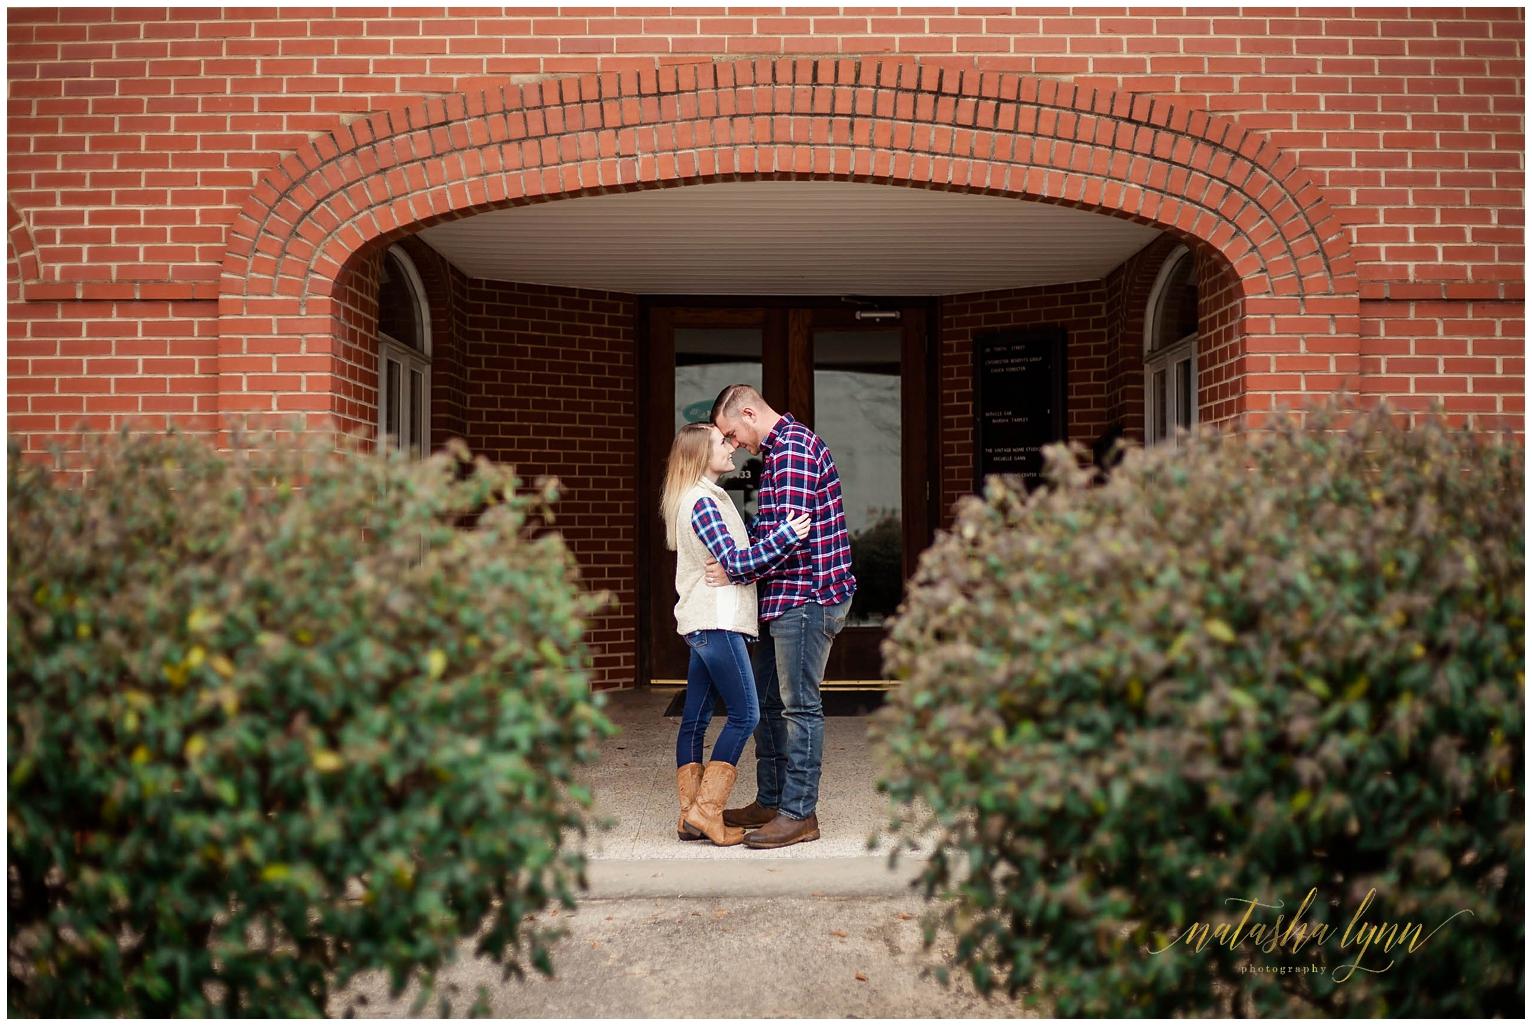 Wilkes+County+Engagement+Photographer_0005.jpg